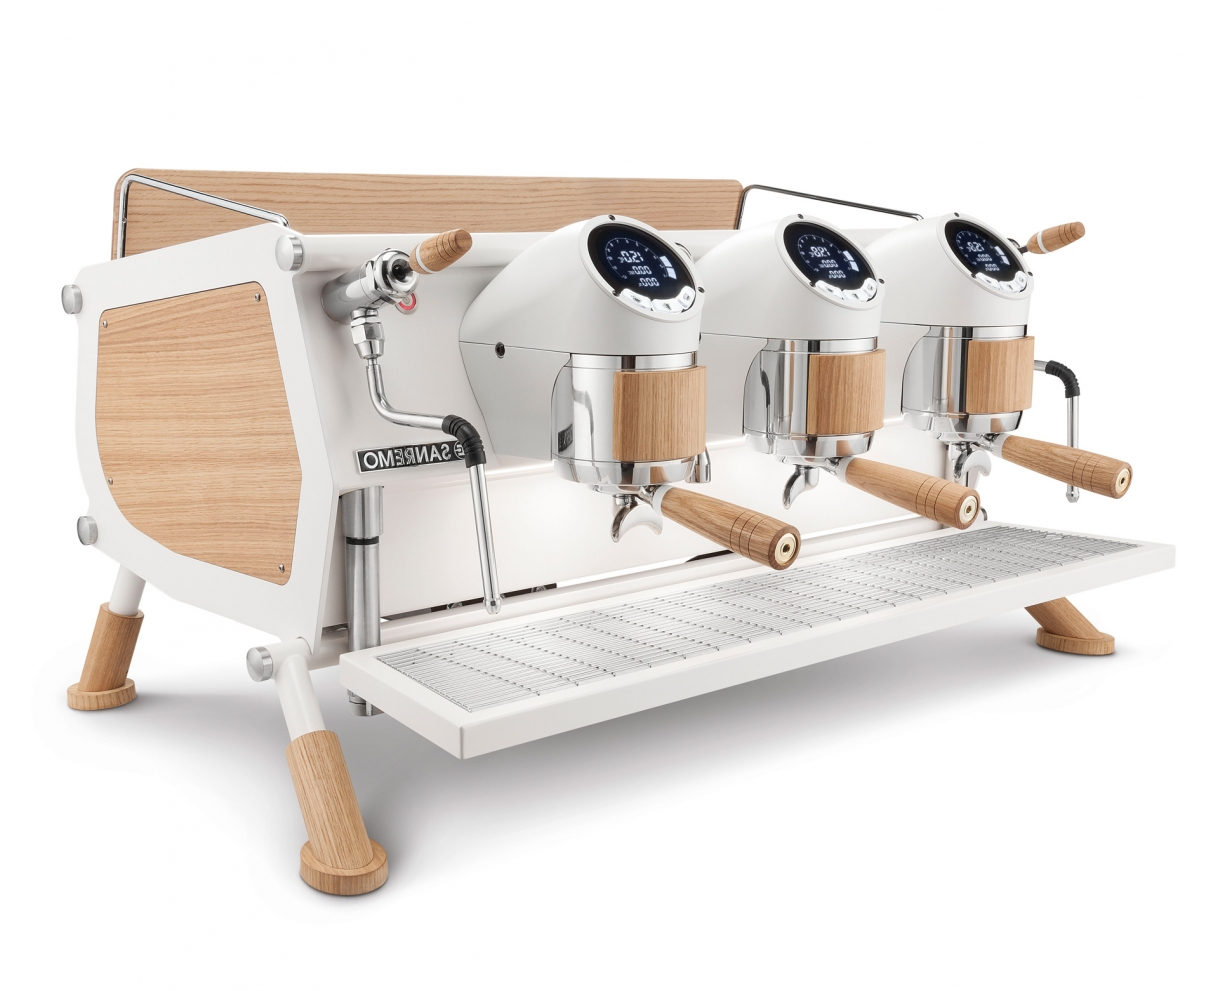 TCO_Sanremo-Cafe-racer_White&Wood-SLIM-3gr-front